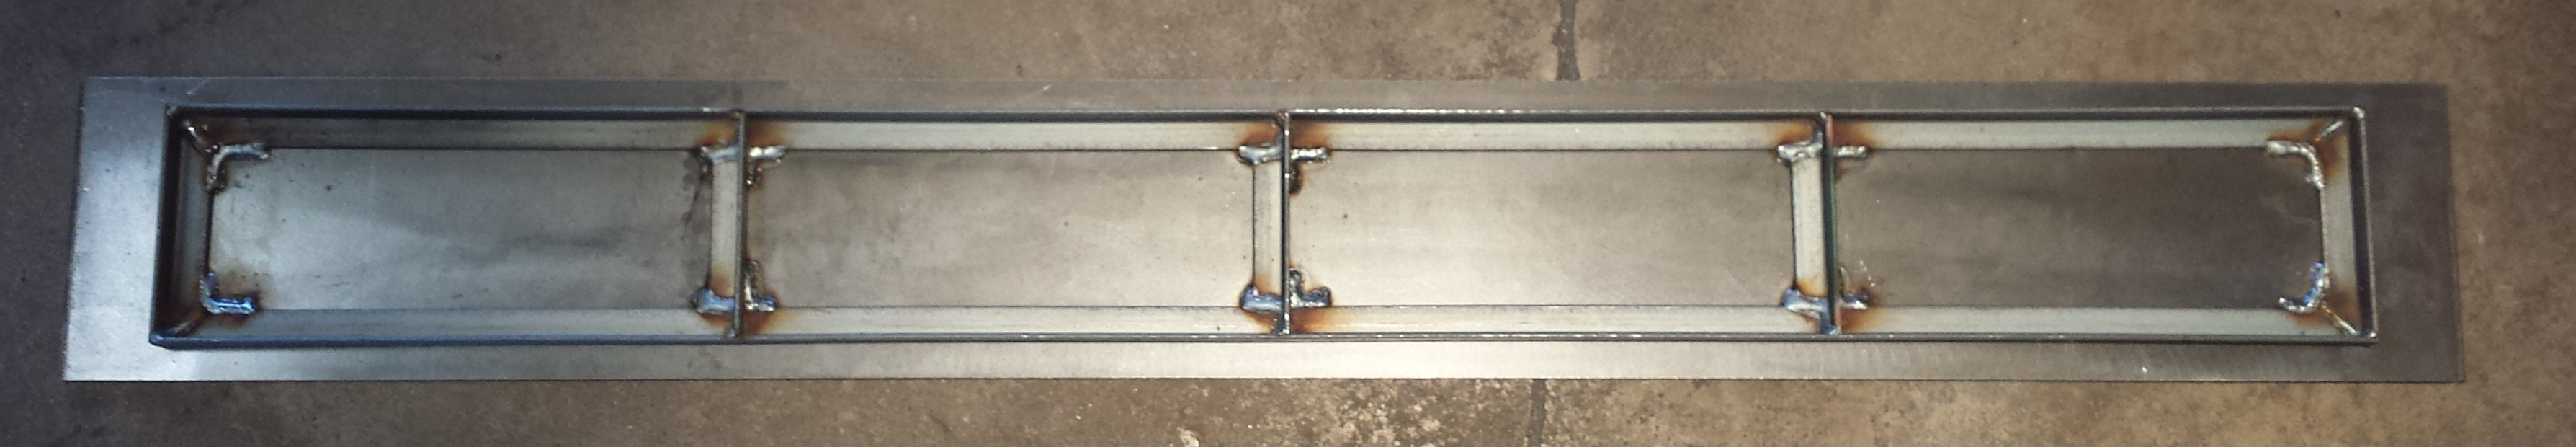 drain-covers-3.jpg